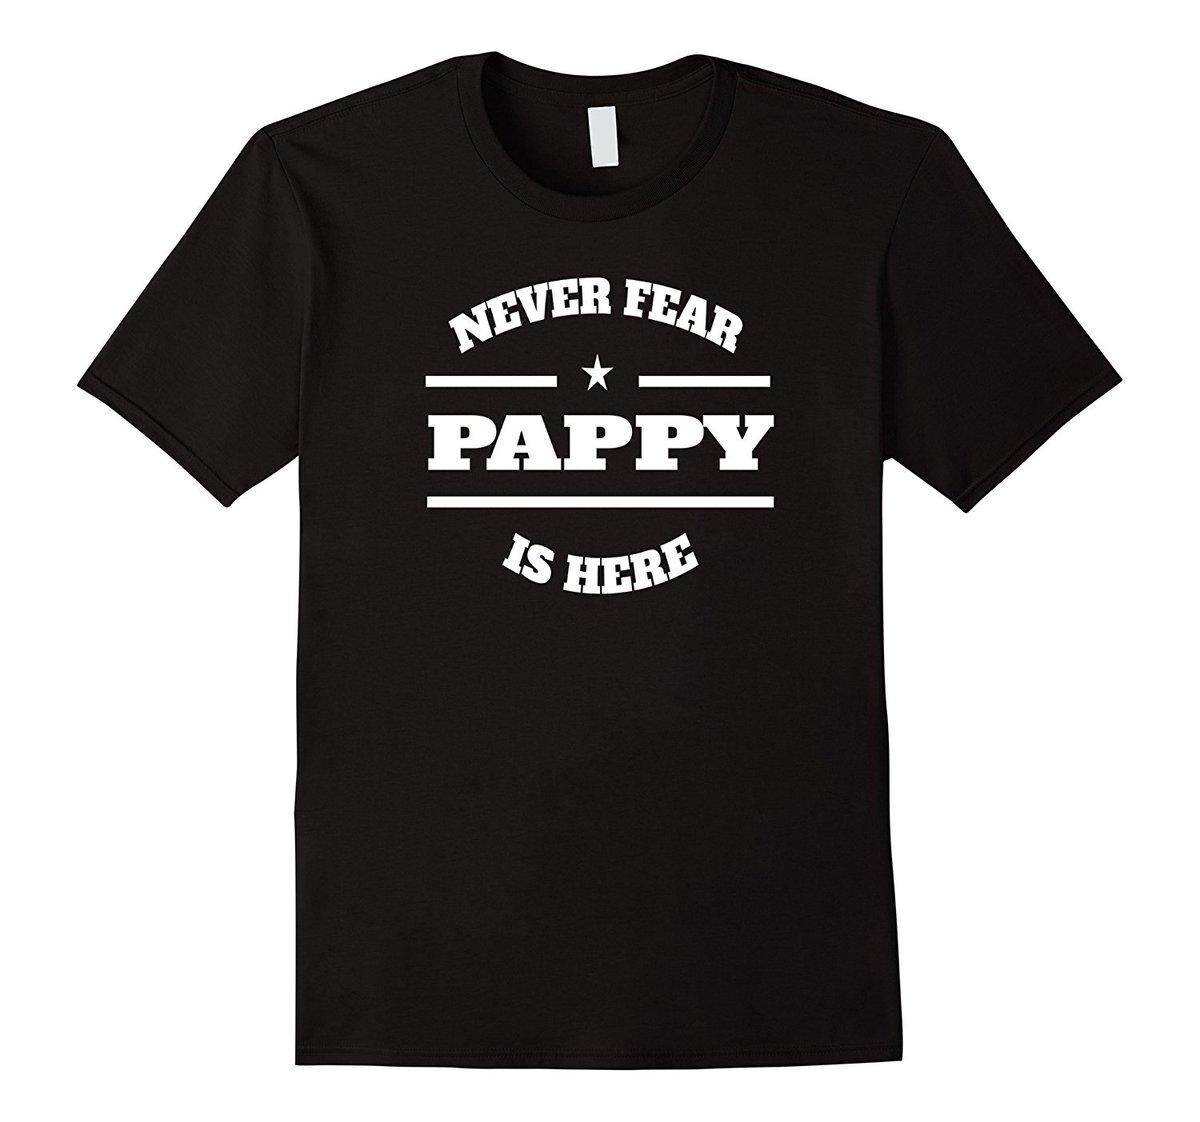 #Pappy Gift T-Shirt - #GrandparentsDay - Never Fear https://t.co/aFSvtIcJdC # https://t.co/noz0hQHH6u